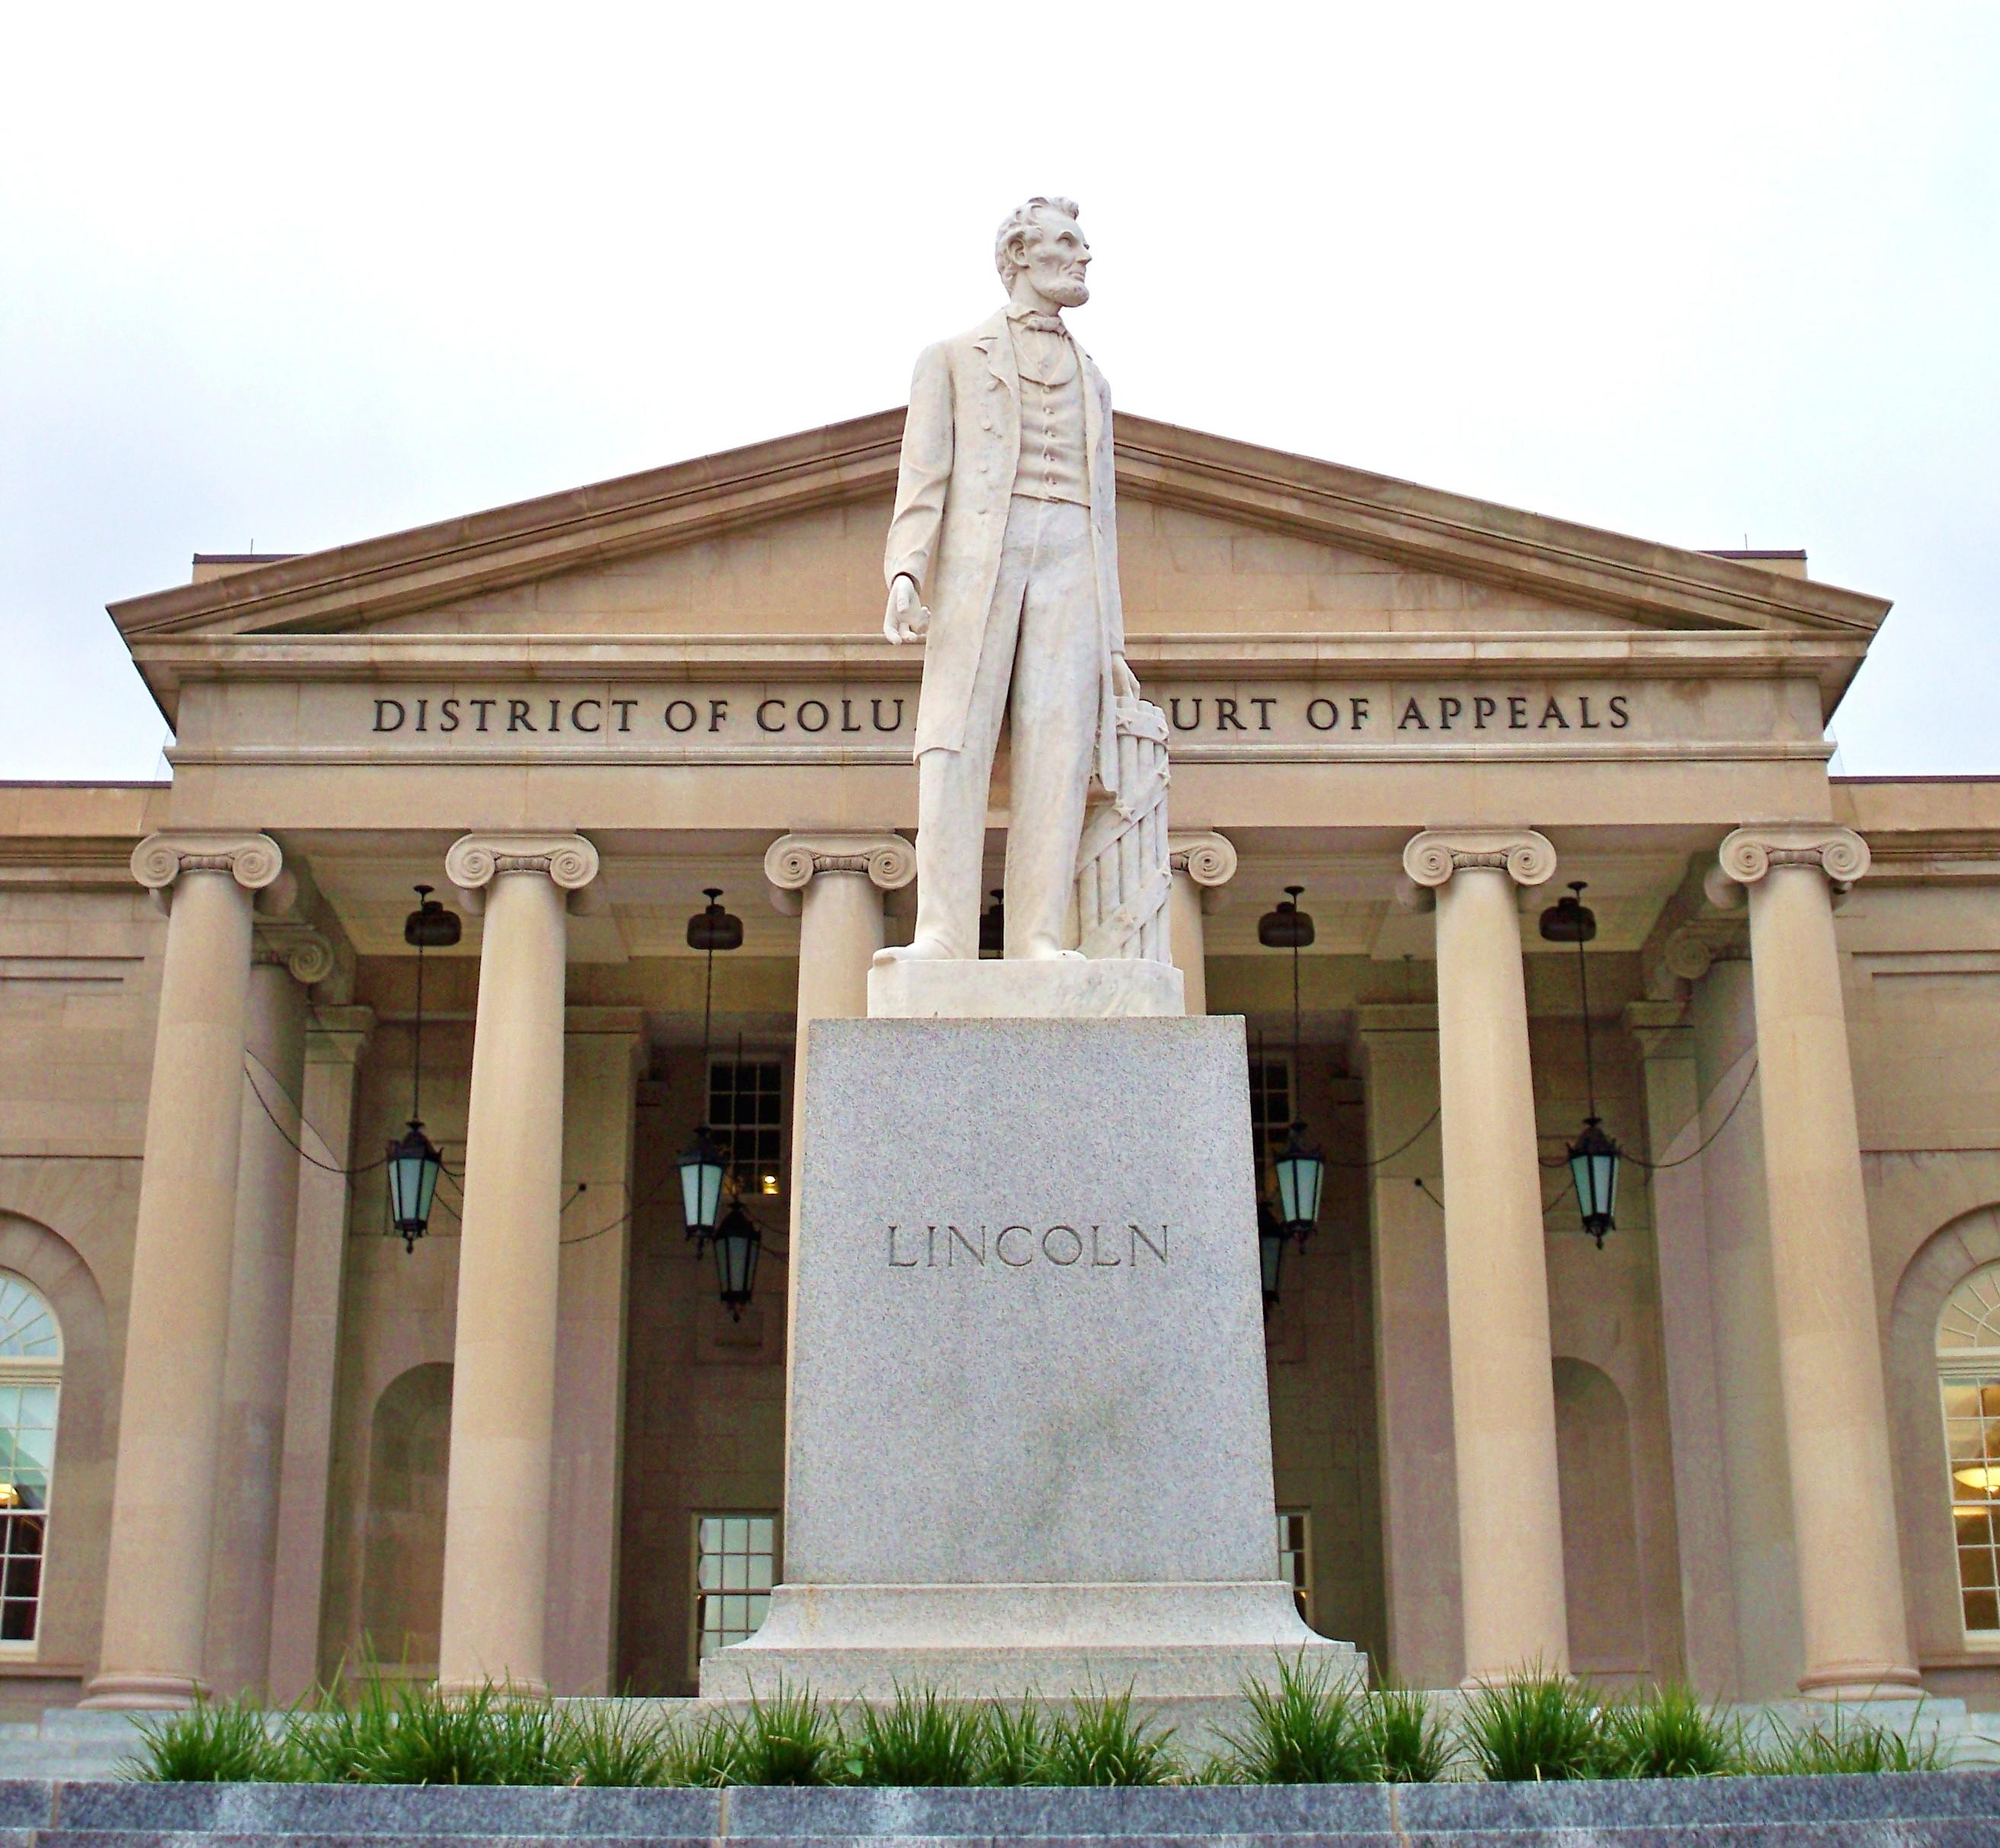 Statue of Lincoln, Washington D.C. Court of Appeals. Photo: Matthew G. Bisanz